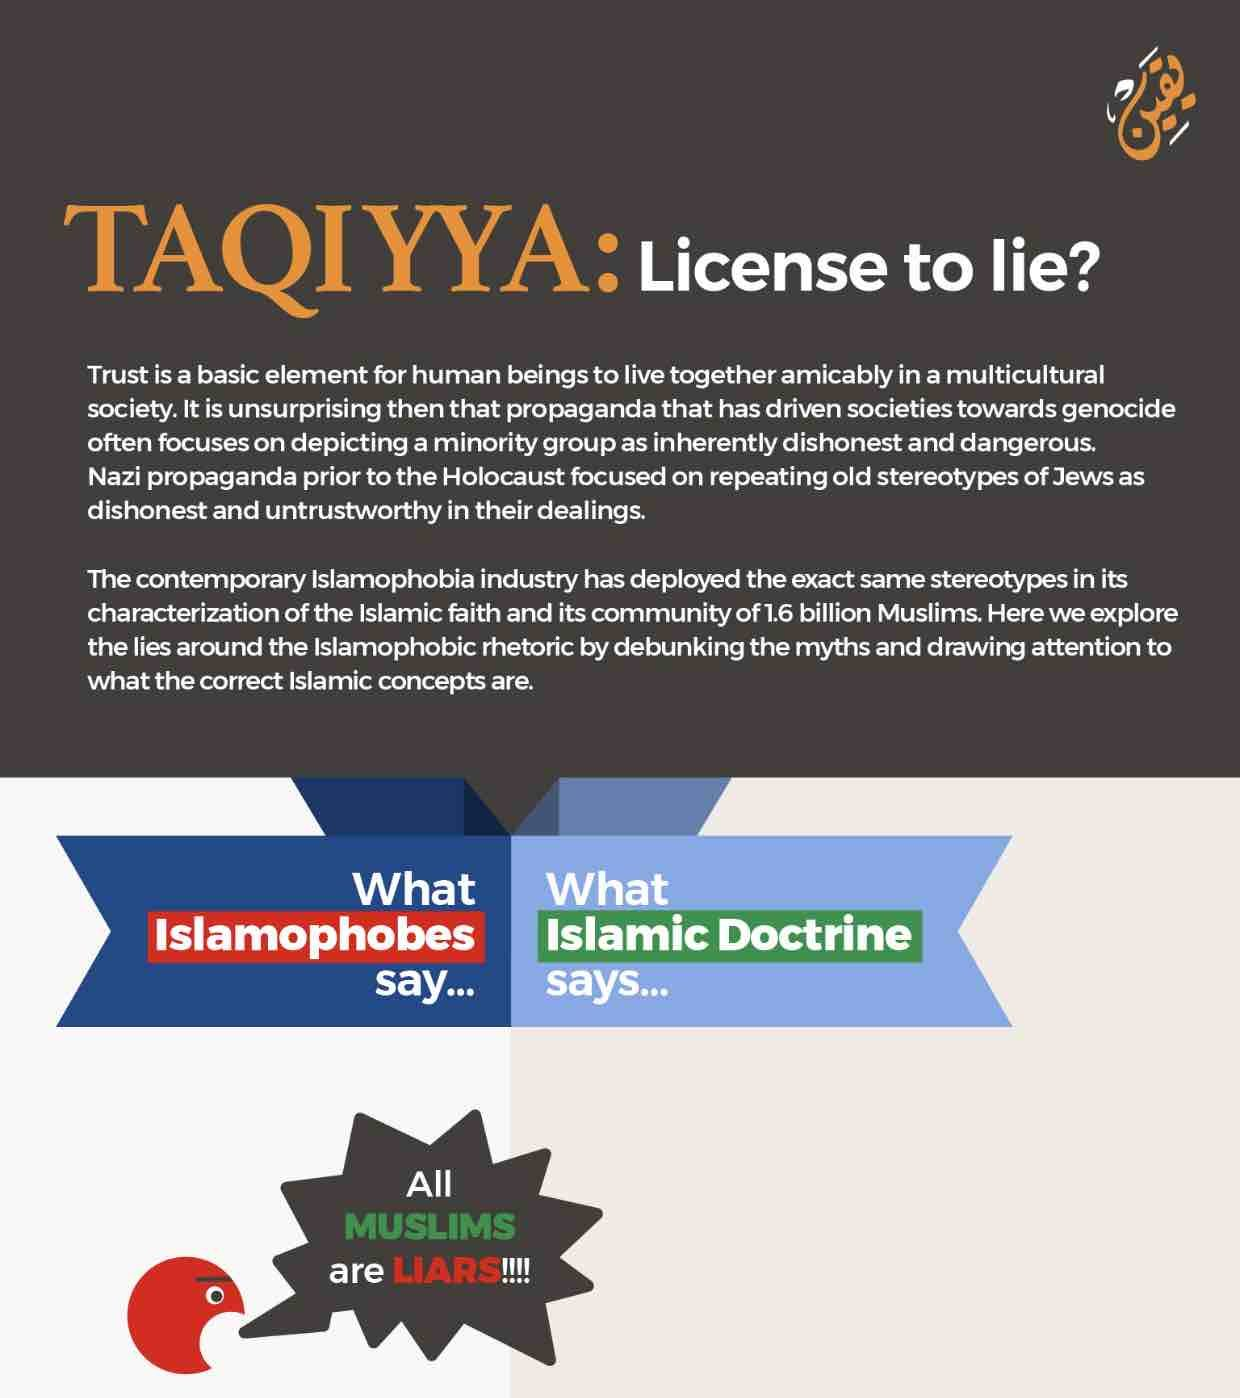 Taqiyya Licence to Lie? infographic